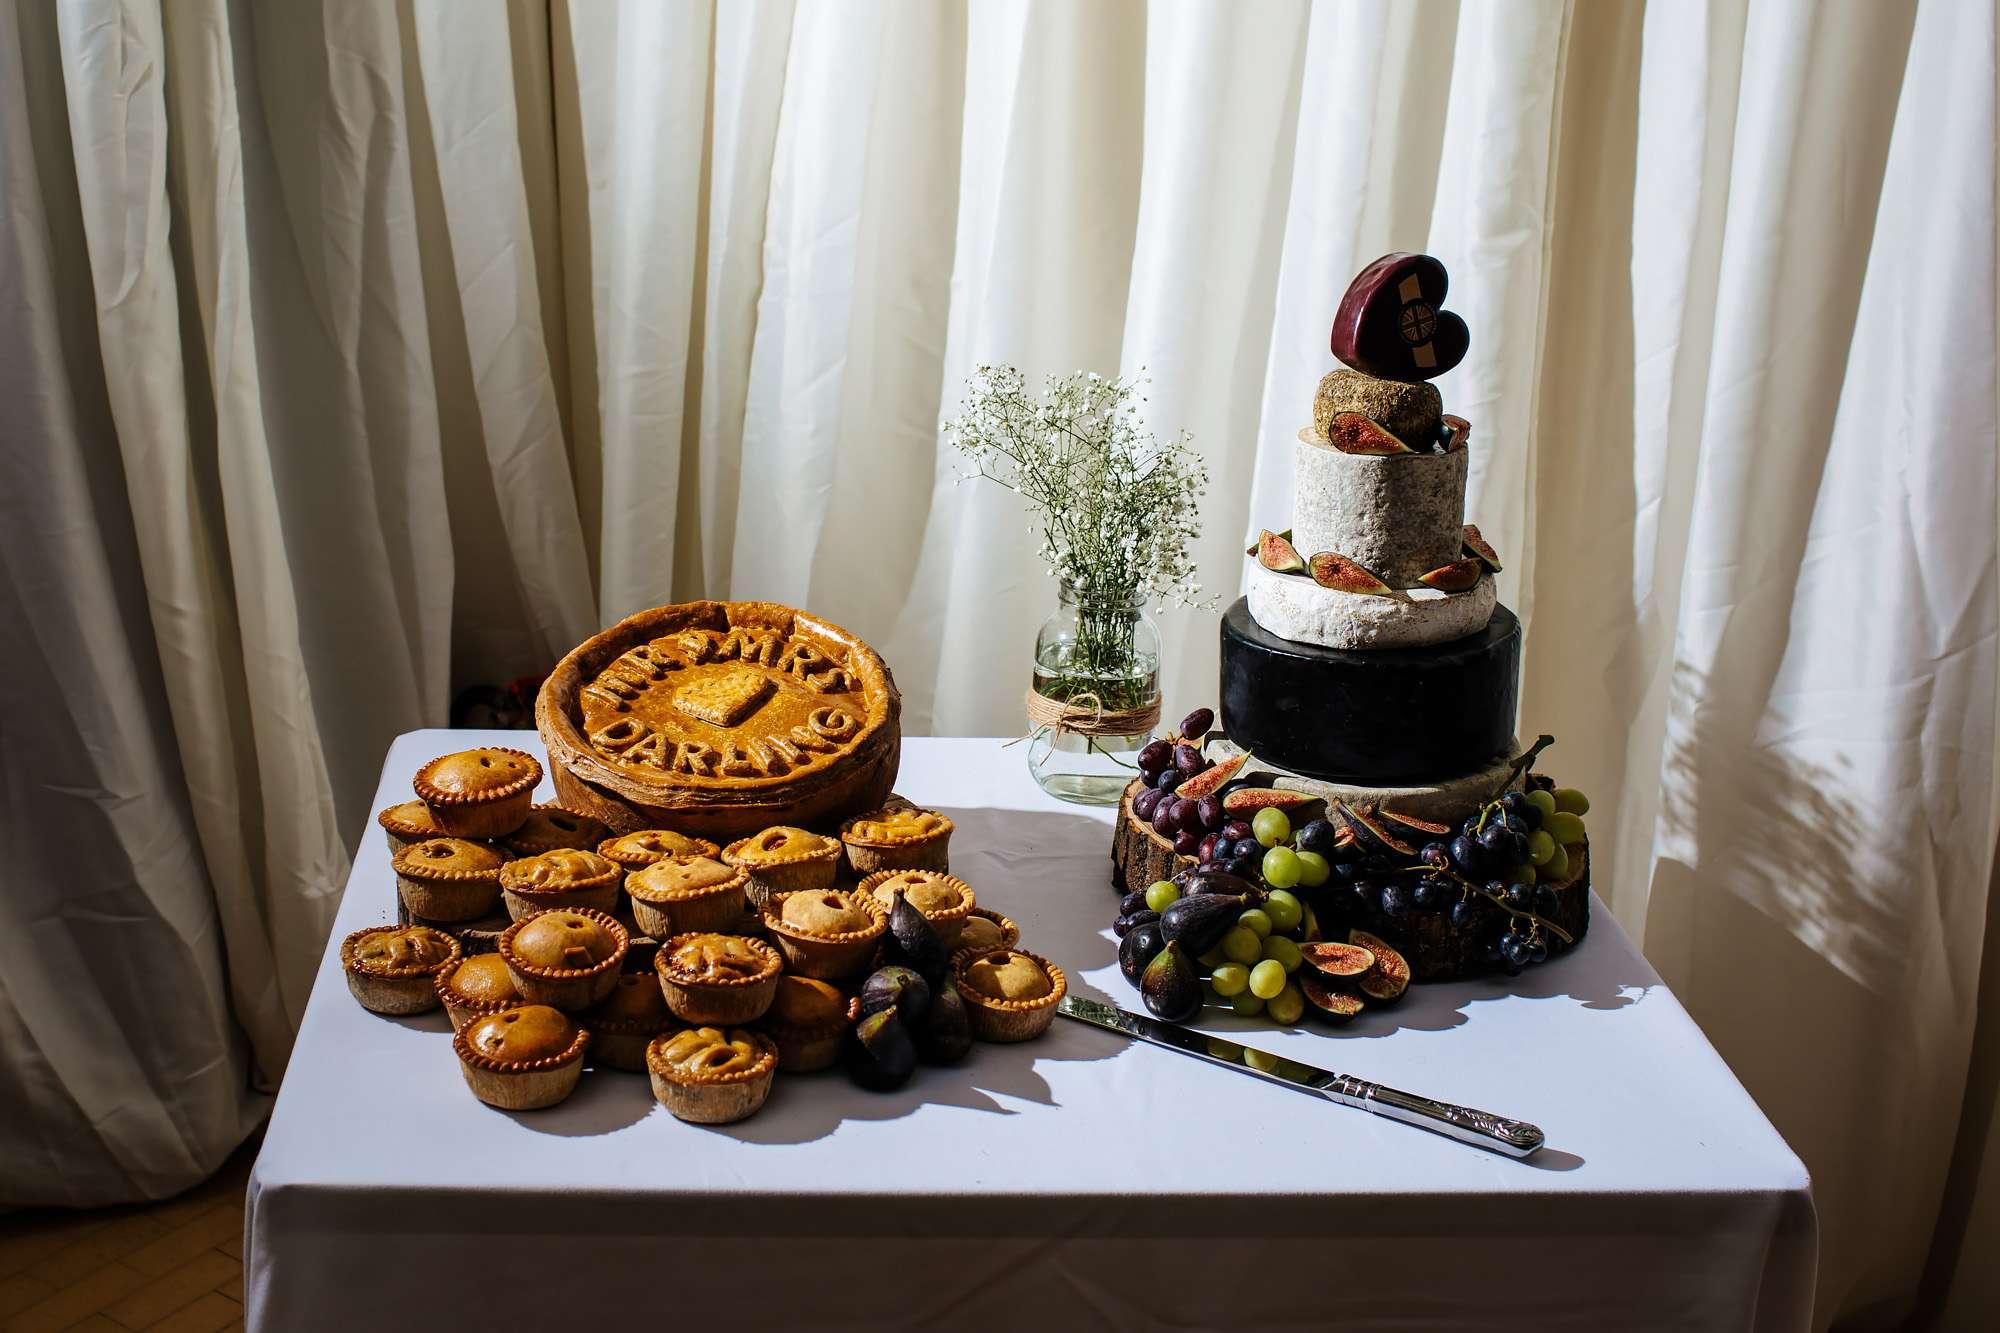 Close up of the wedding cake and pork pie cake at a wedding